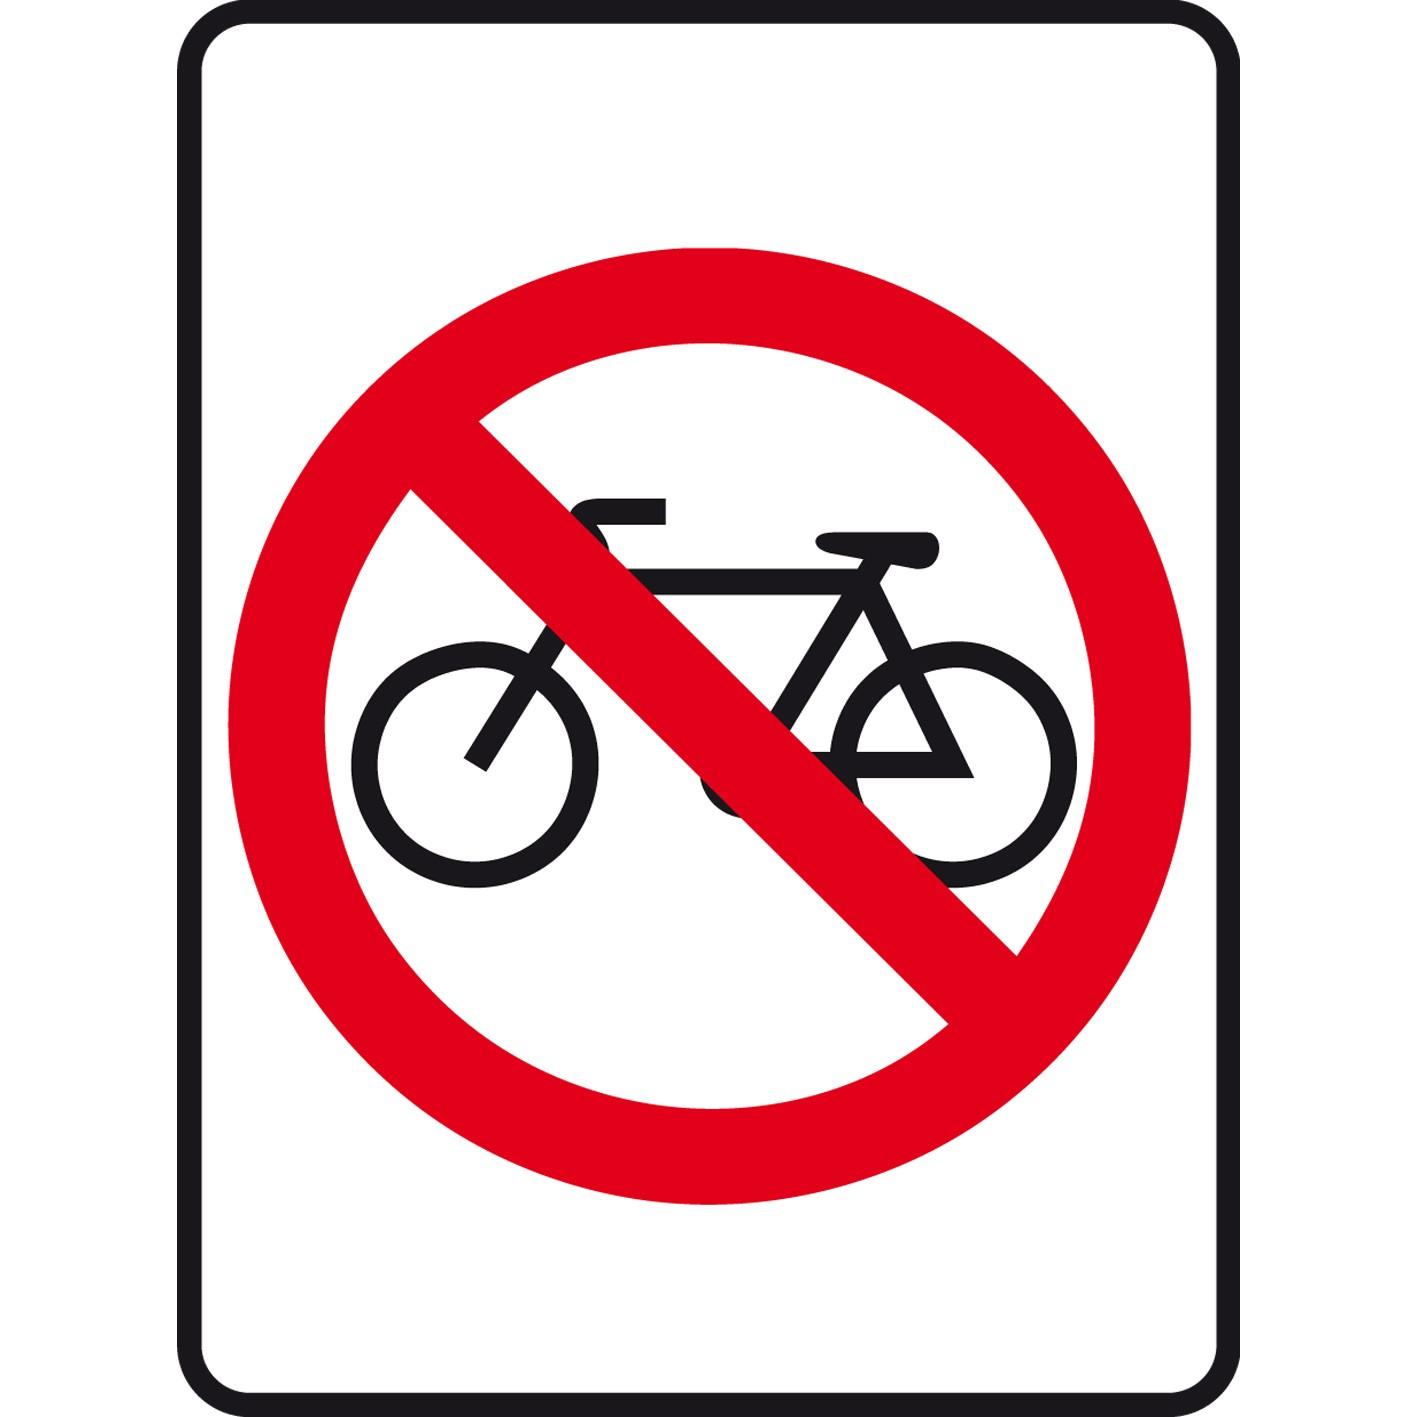 No bicycle sign photo